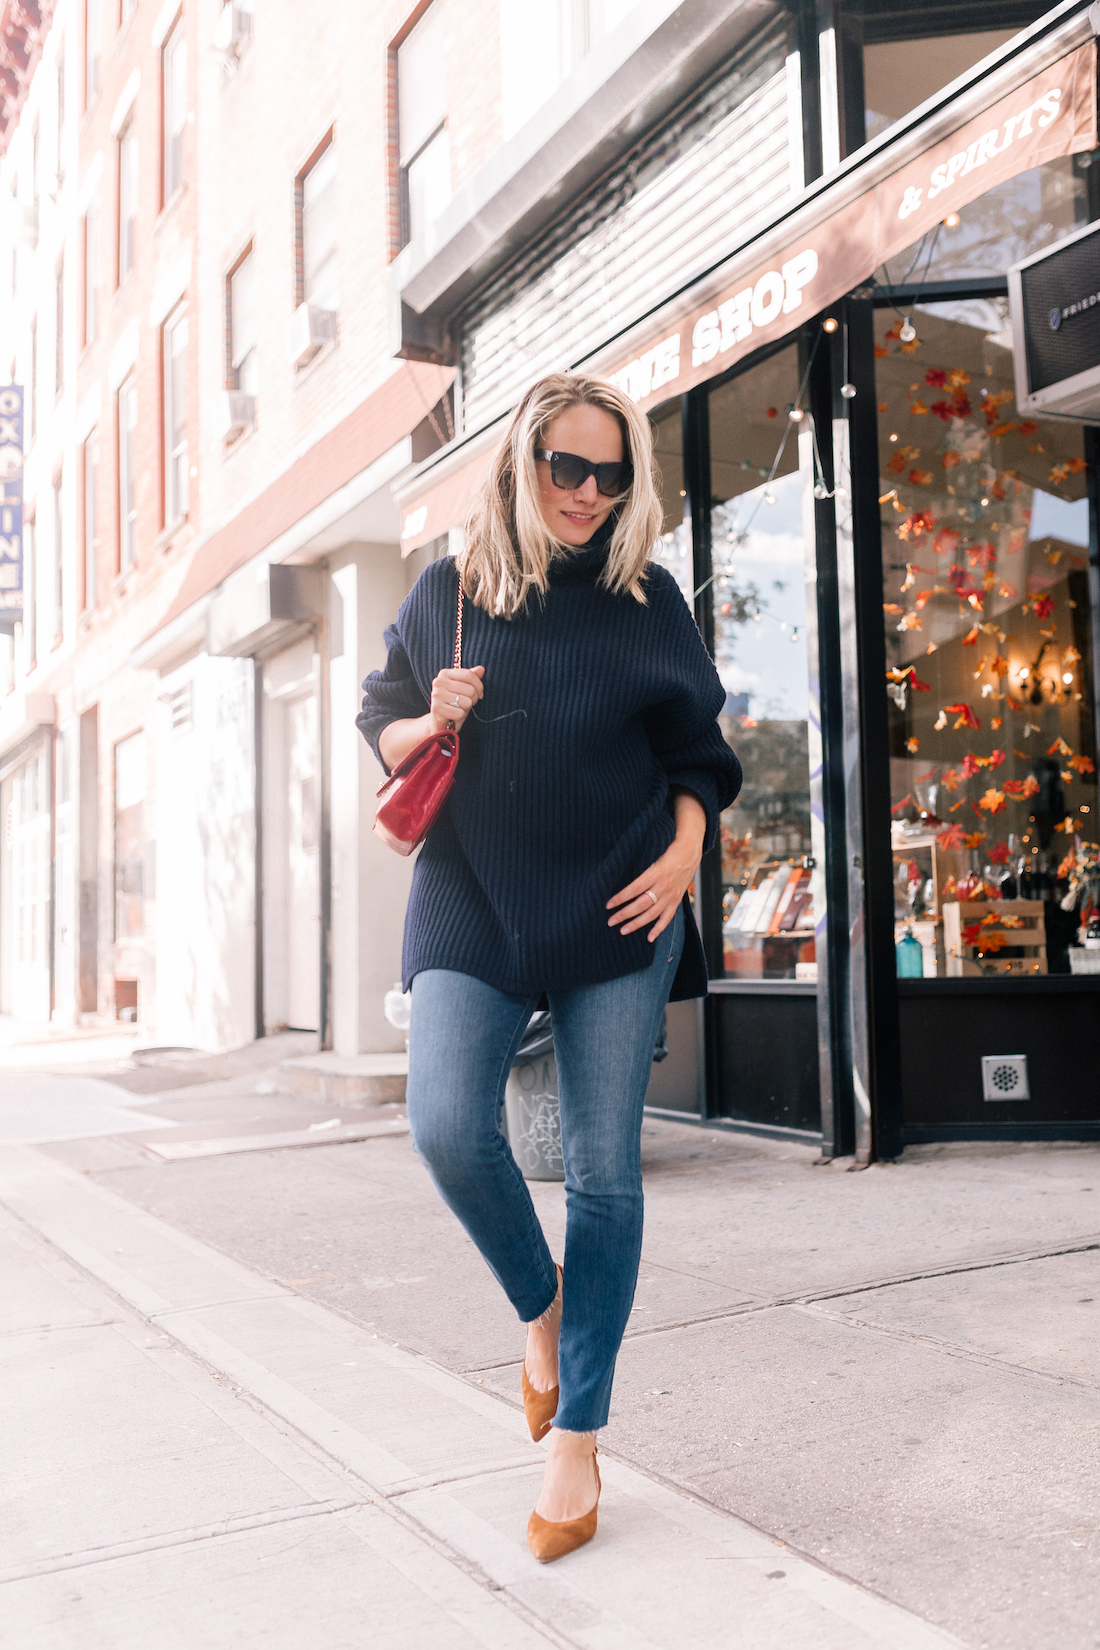 Outfit Details:Acne Oversized Sweater//Good American Jeans //Vintage Chanel Bag // Rachel Comey Earrings //Celine Sunglasses// Sarah Flint Slingbacks